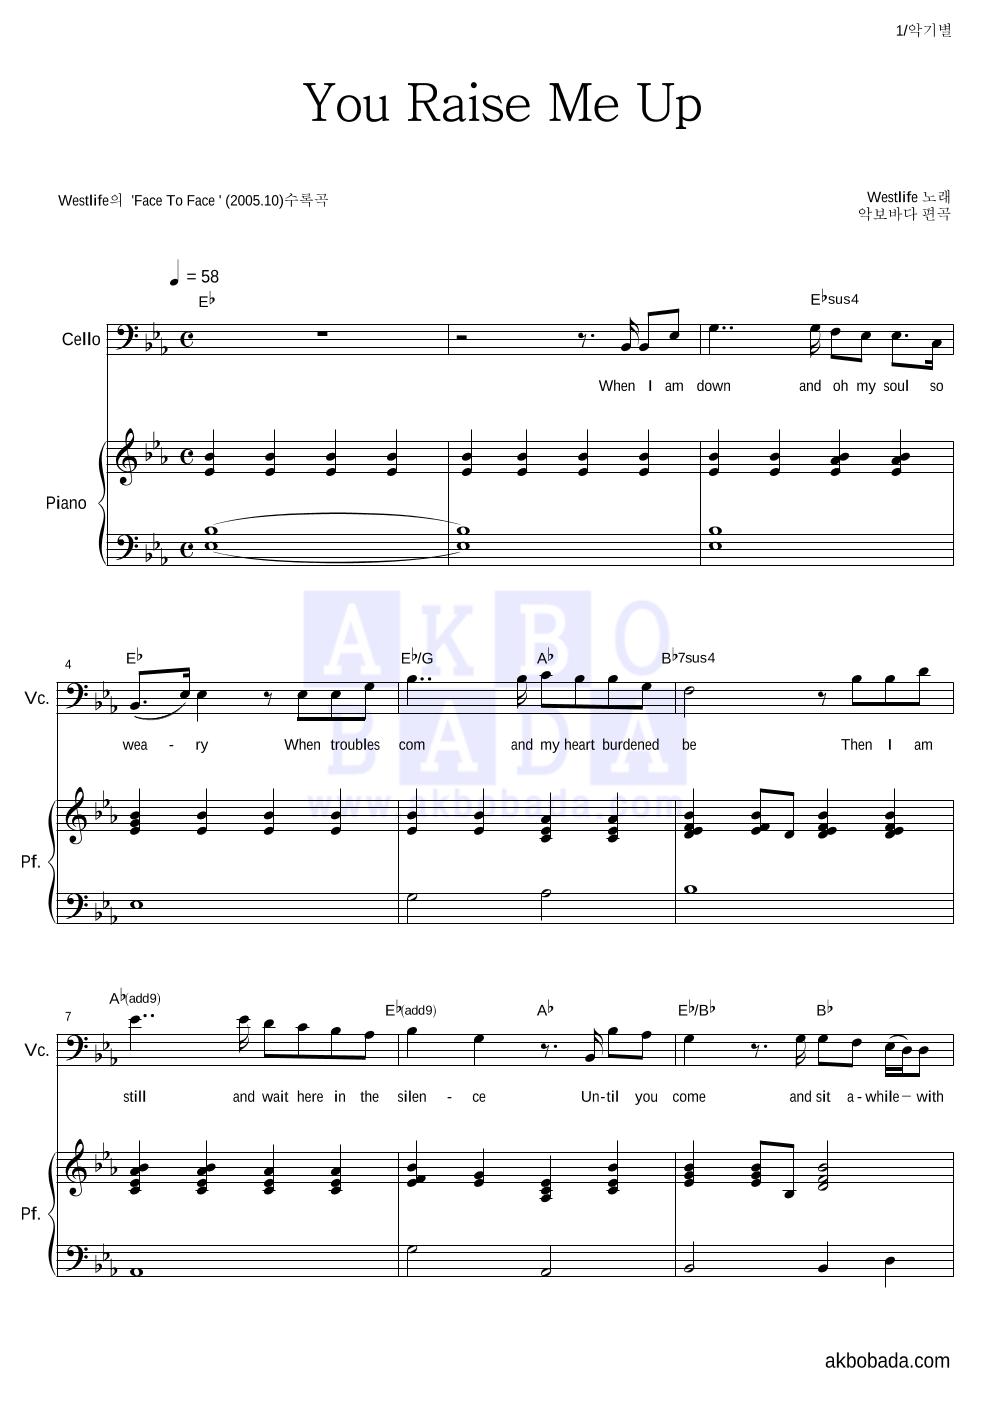 Westlife - You Raise Me Up 첼로&피아노 악보